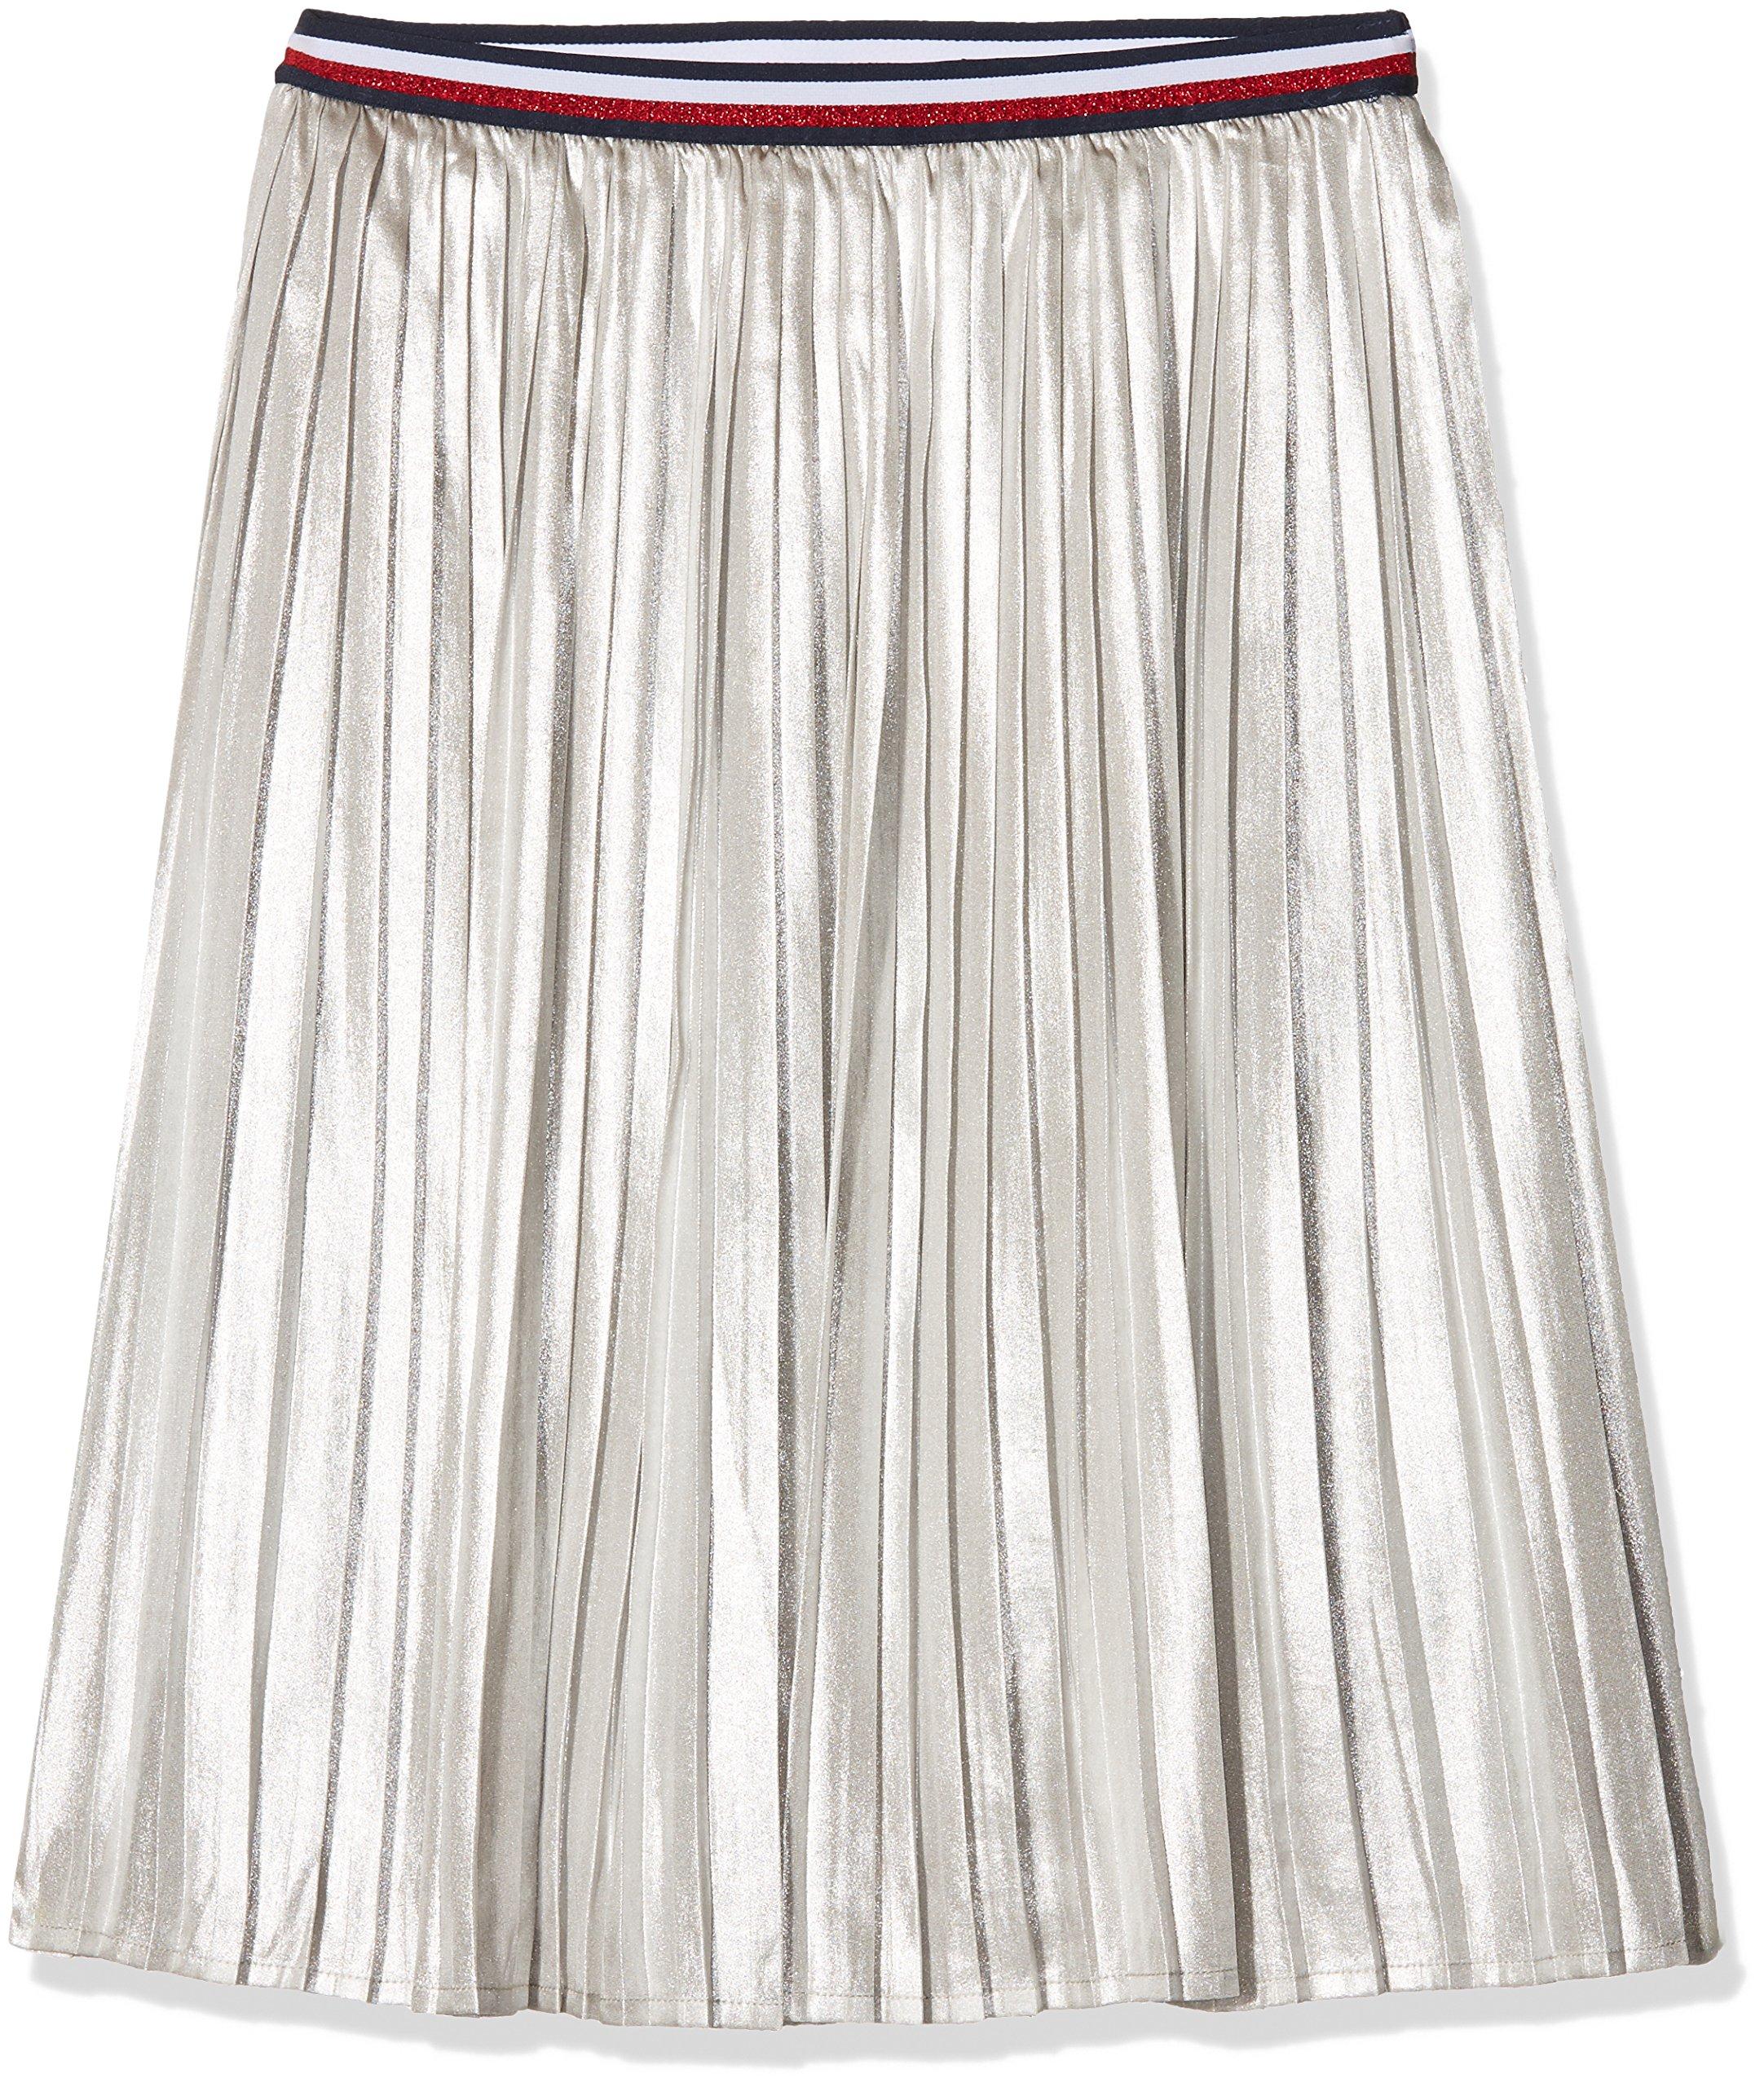 Tommy Hilfiger H Metallic Skirt Falda para Niñas